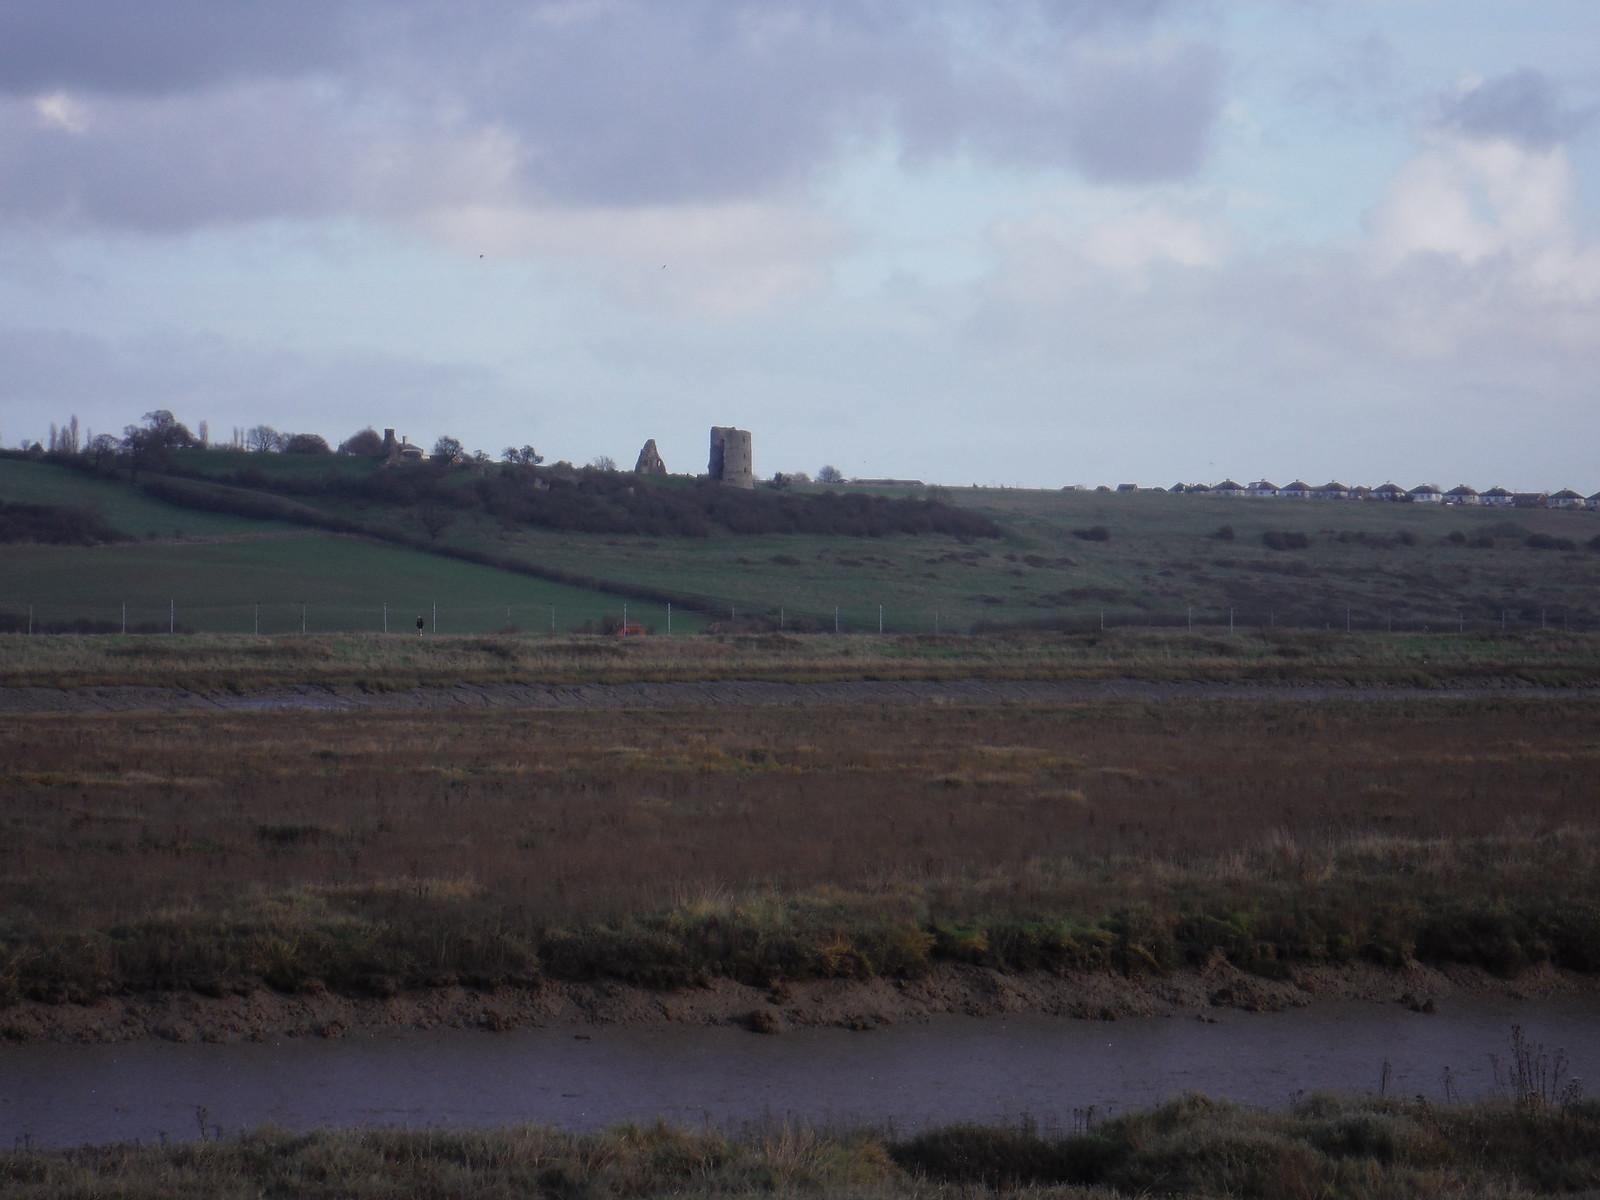 Hadleigh Castle across Benfleet Creek, from Canvey Island SWC Walk 258 Benfleet Circular (via Canvey Island)